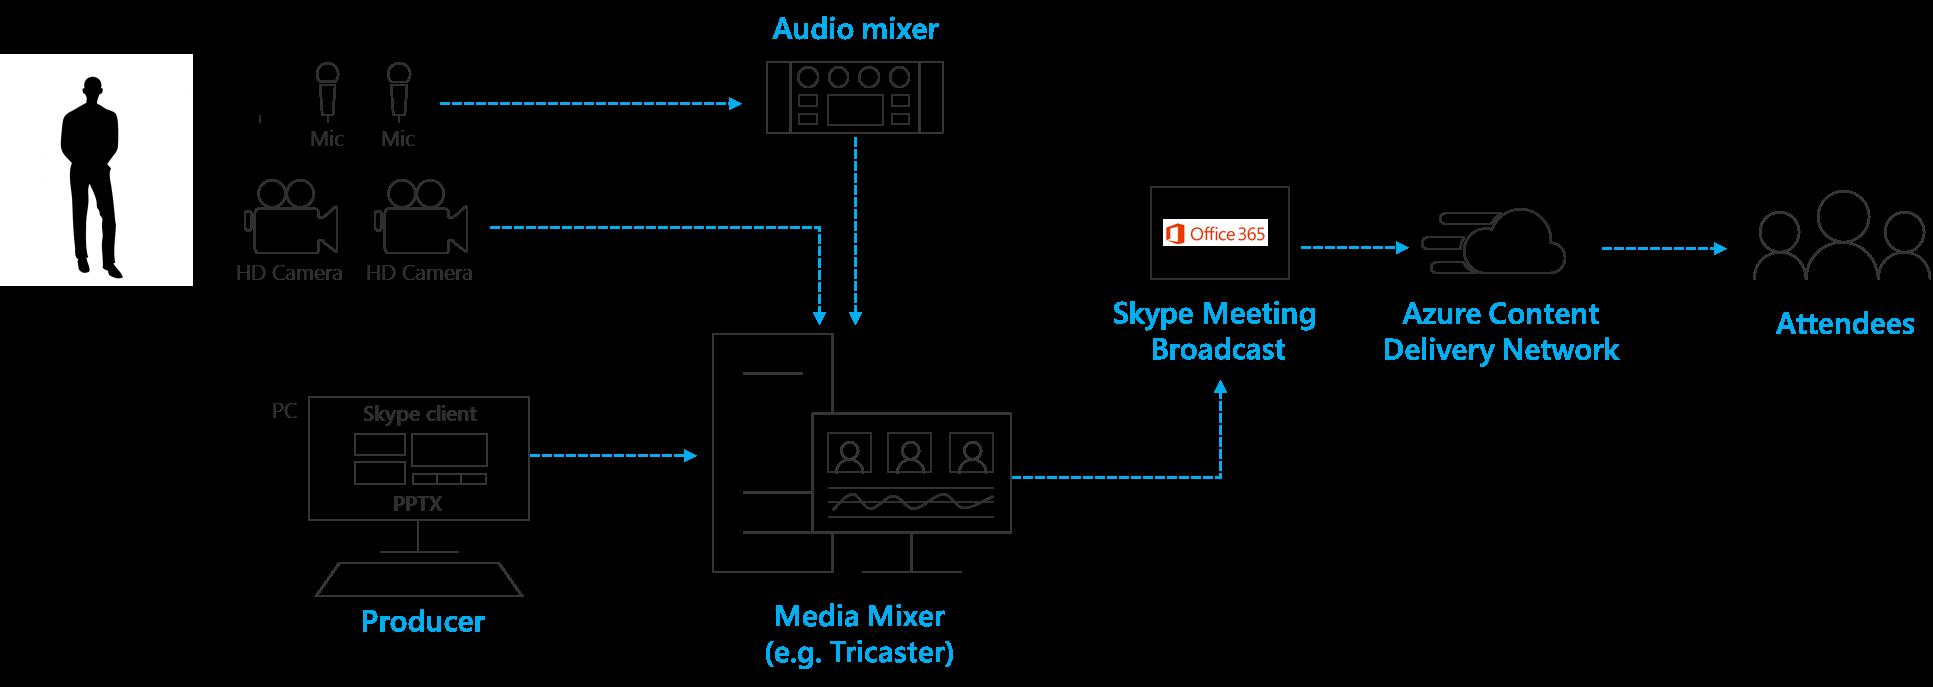 Mengalihkan beberapa sumber dalam mixer penglihatan perangkat keras